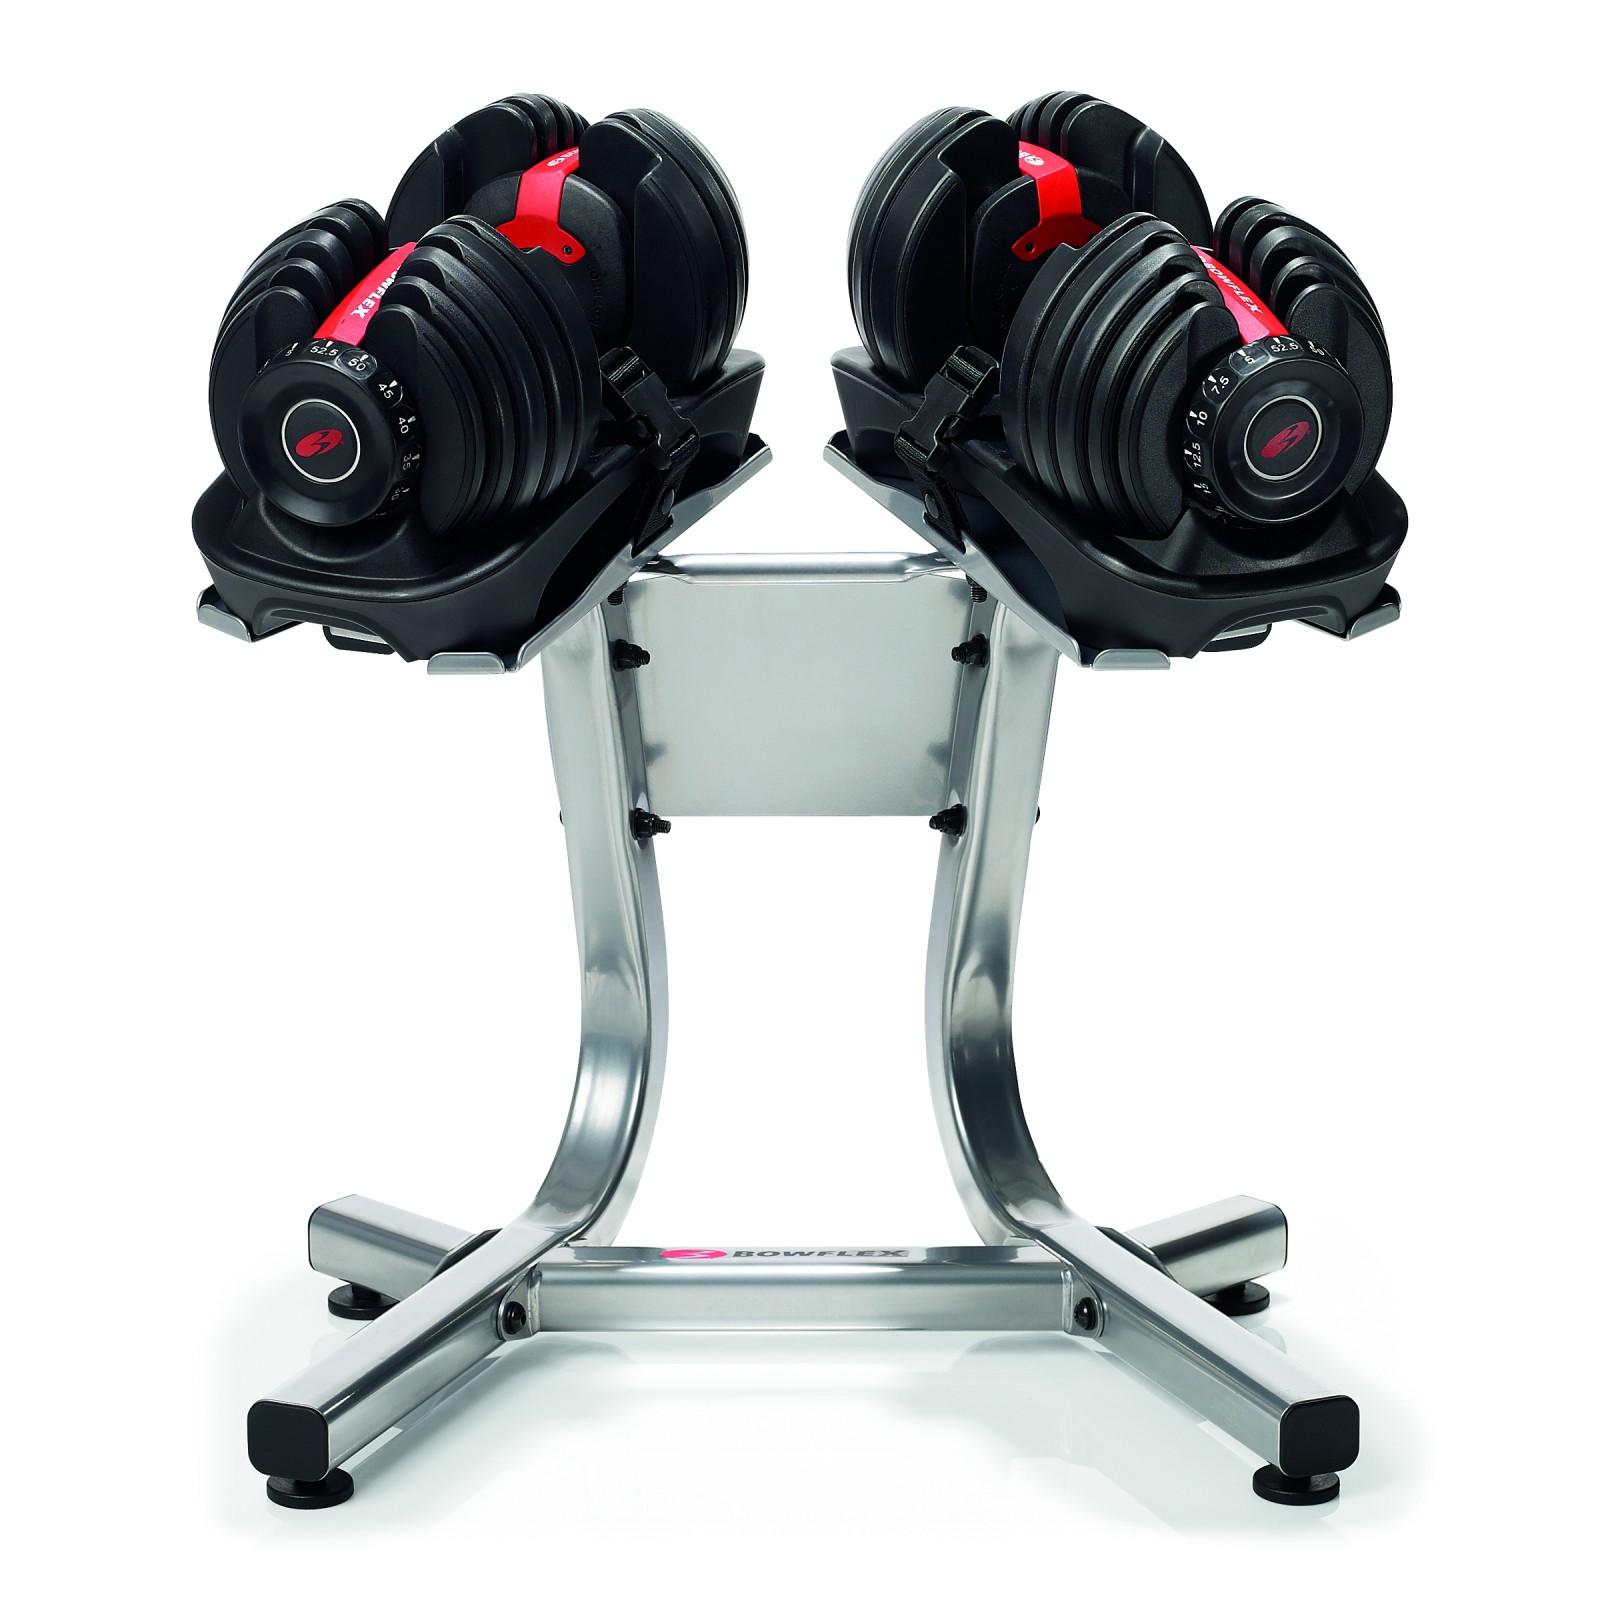 Bowflex Adjustable Dumbbells Instructions: Bowflex SelectTech BF 1090Dumbbell Set + Dumbbell Stand